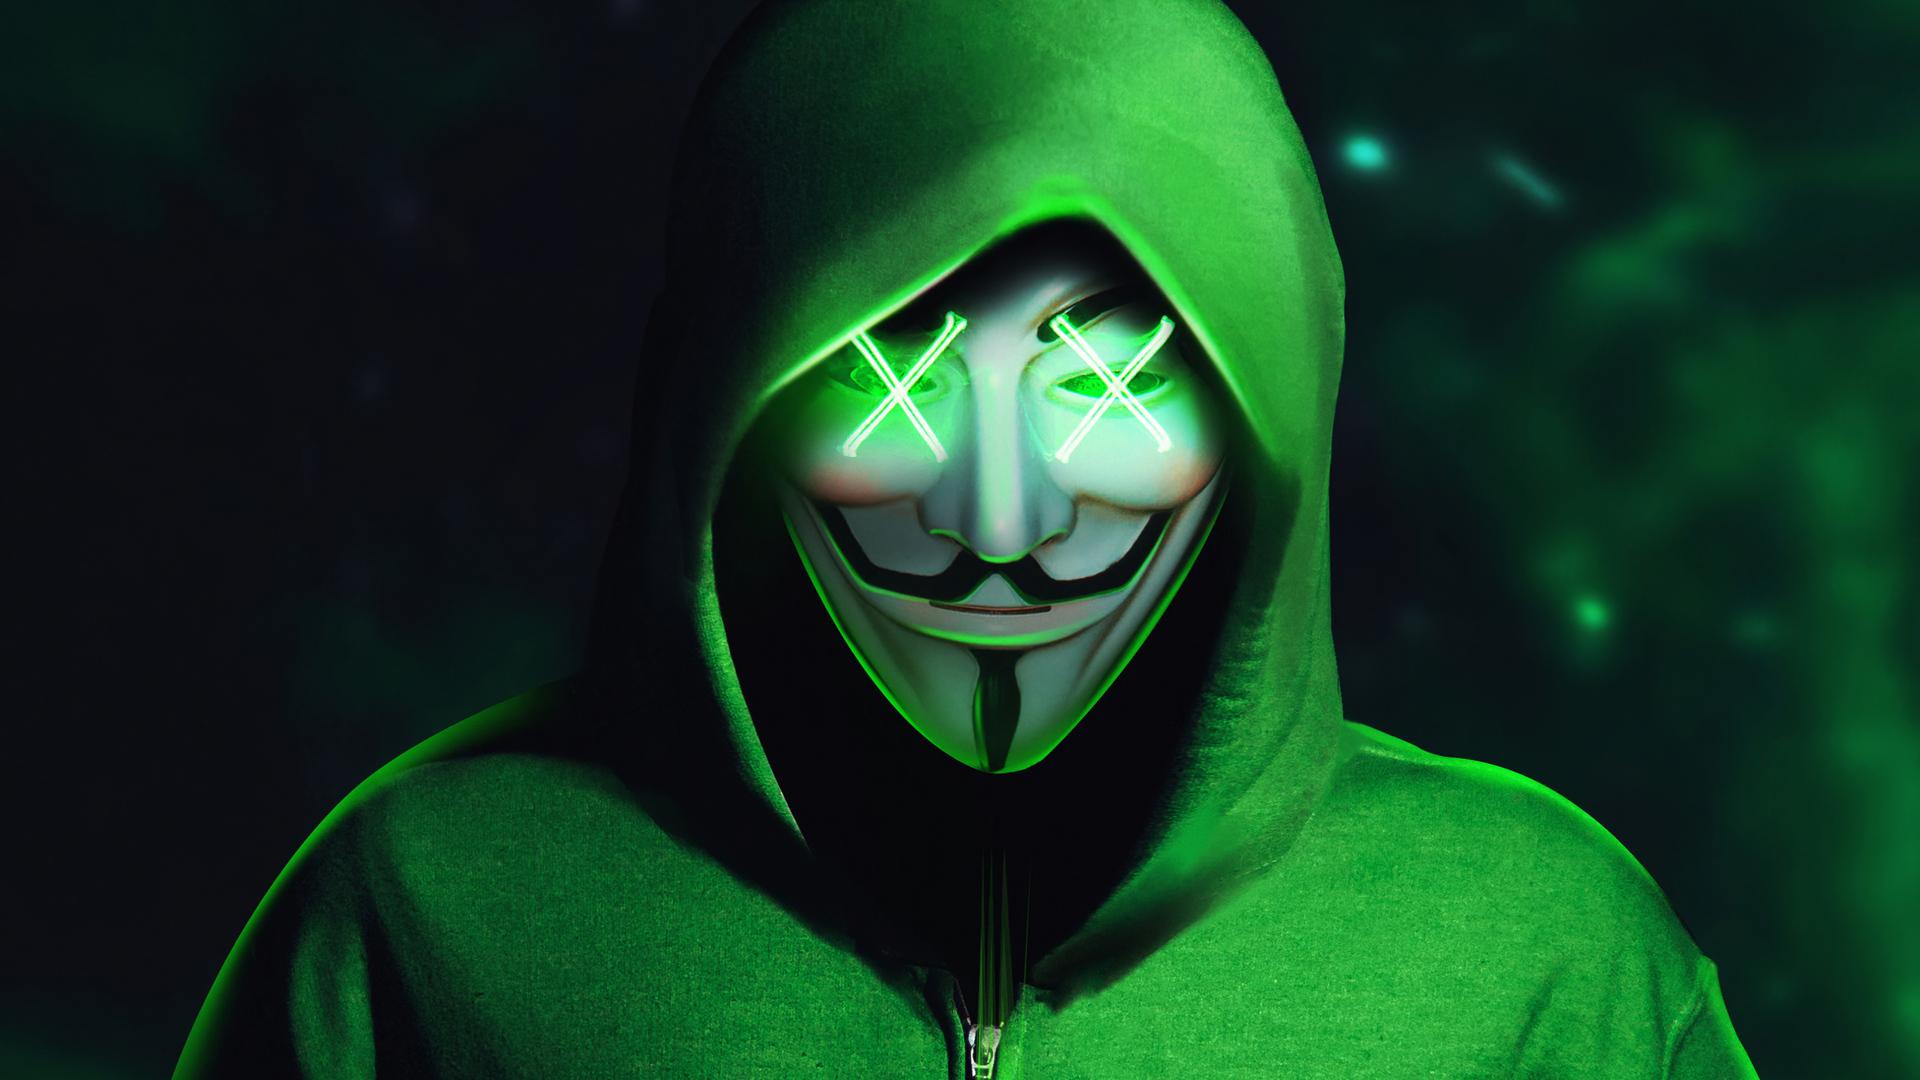 4k mask wallpapers hoodie anonymus joker backgrounds wallpaperaccess 2160 1080p desktop laptop resolution anonimo capa verde parede papel q8 1933